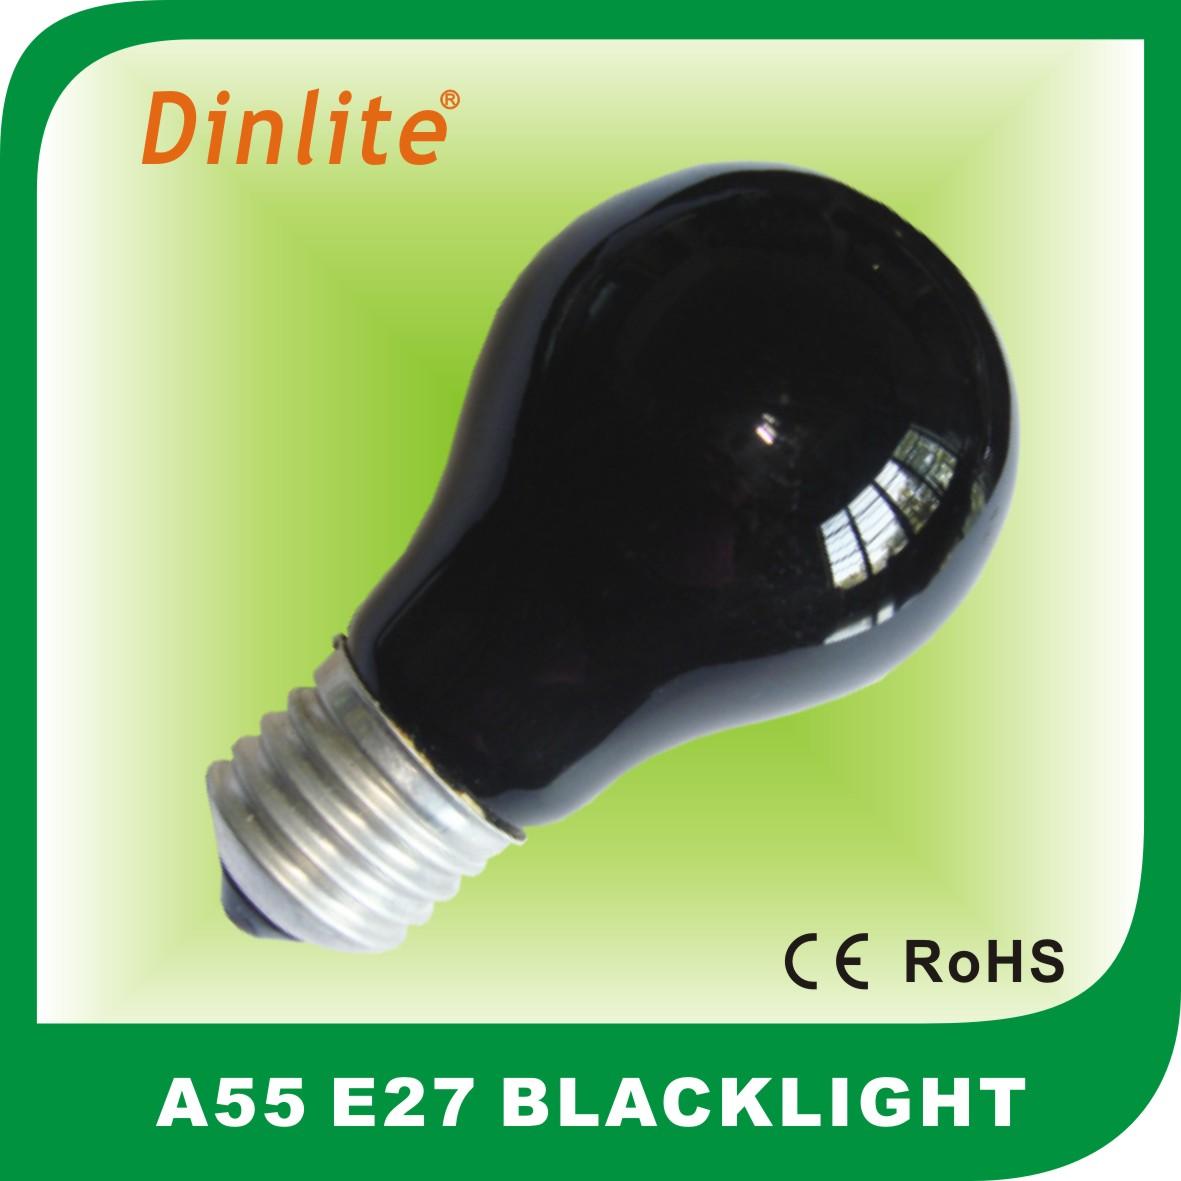 A55 Blacklight Incandesent Bulb Decorative Lamp Manufacturers